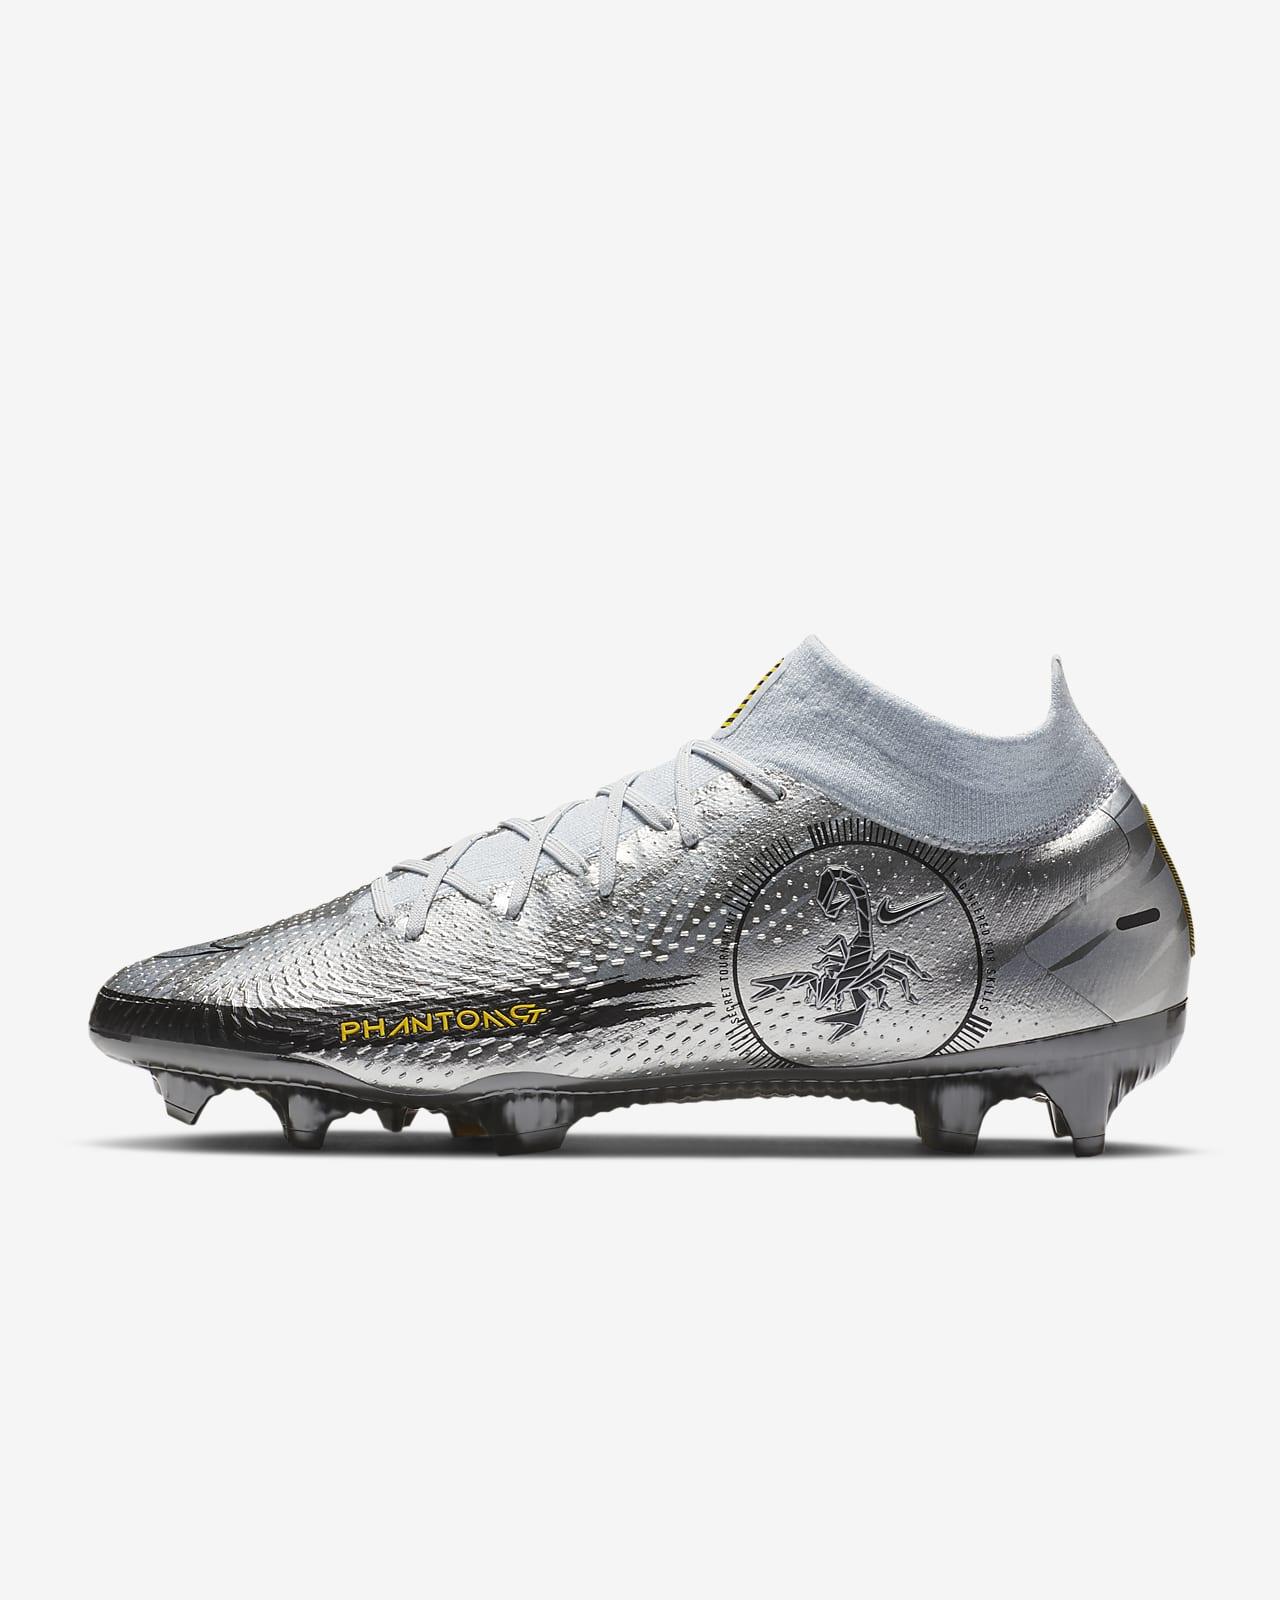 Nike Phantom Scorpion Elite Dynamic Fit FG Voetbalschoen (stevige ondergrond)